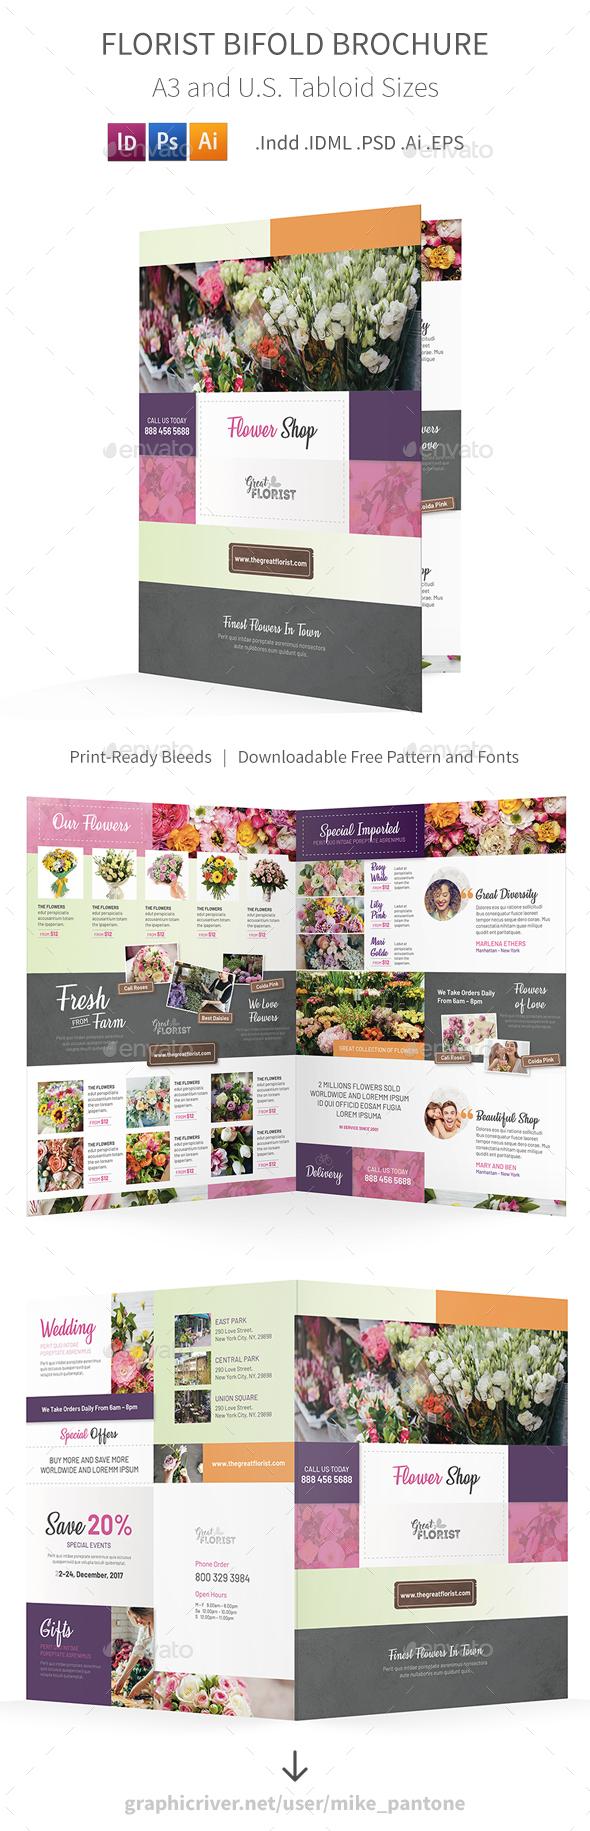 GraphicRiver Florist Bifold Halffold Brochure 3 21044895